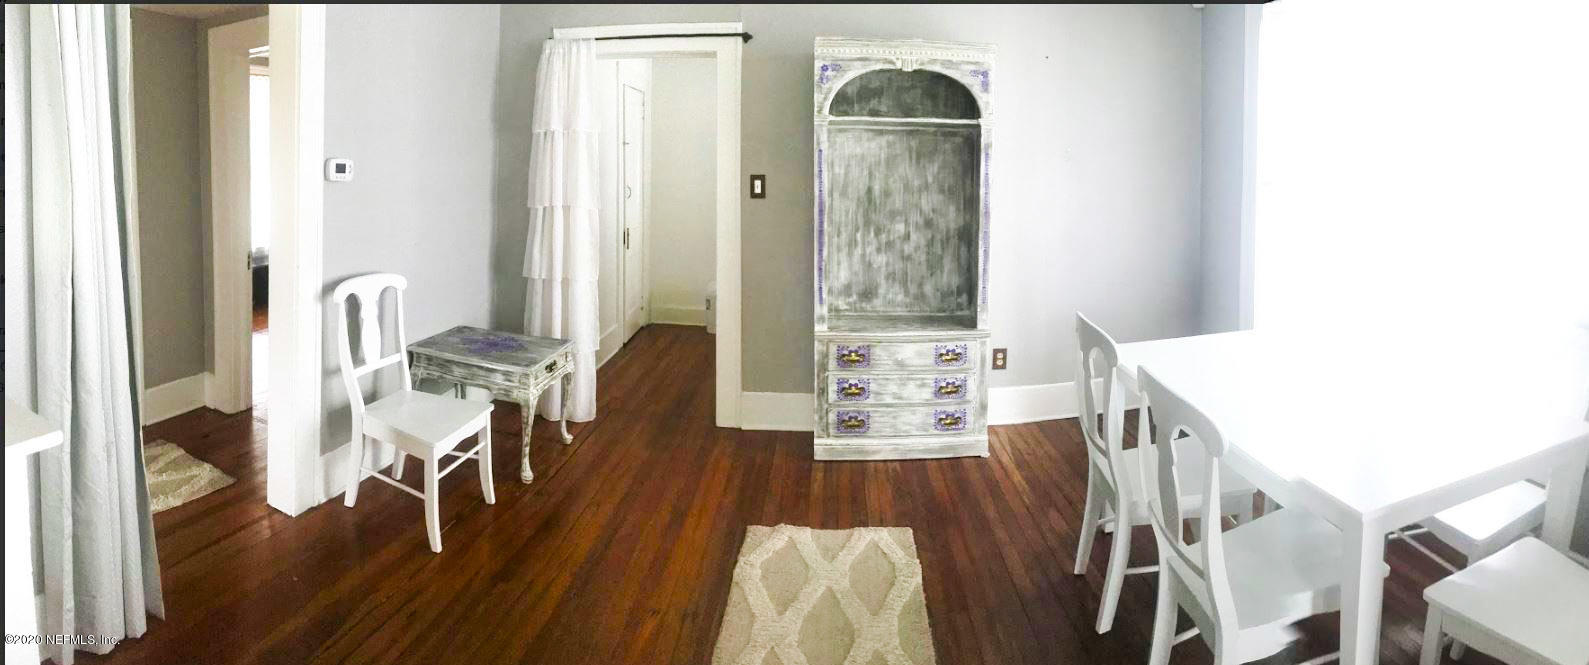 1452 NALDO, JACKSONVILLE, FLORIDA 32207, ,Commercial,For sale,NALDO,1081424